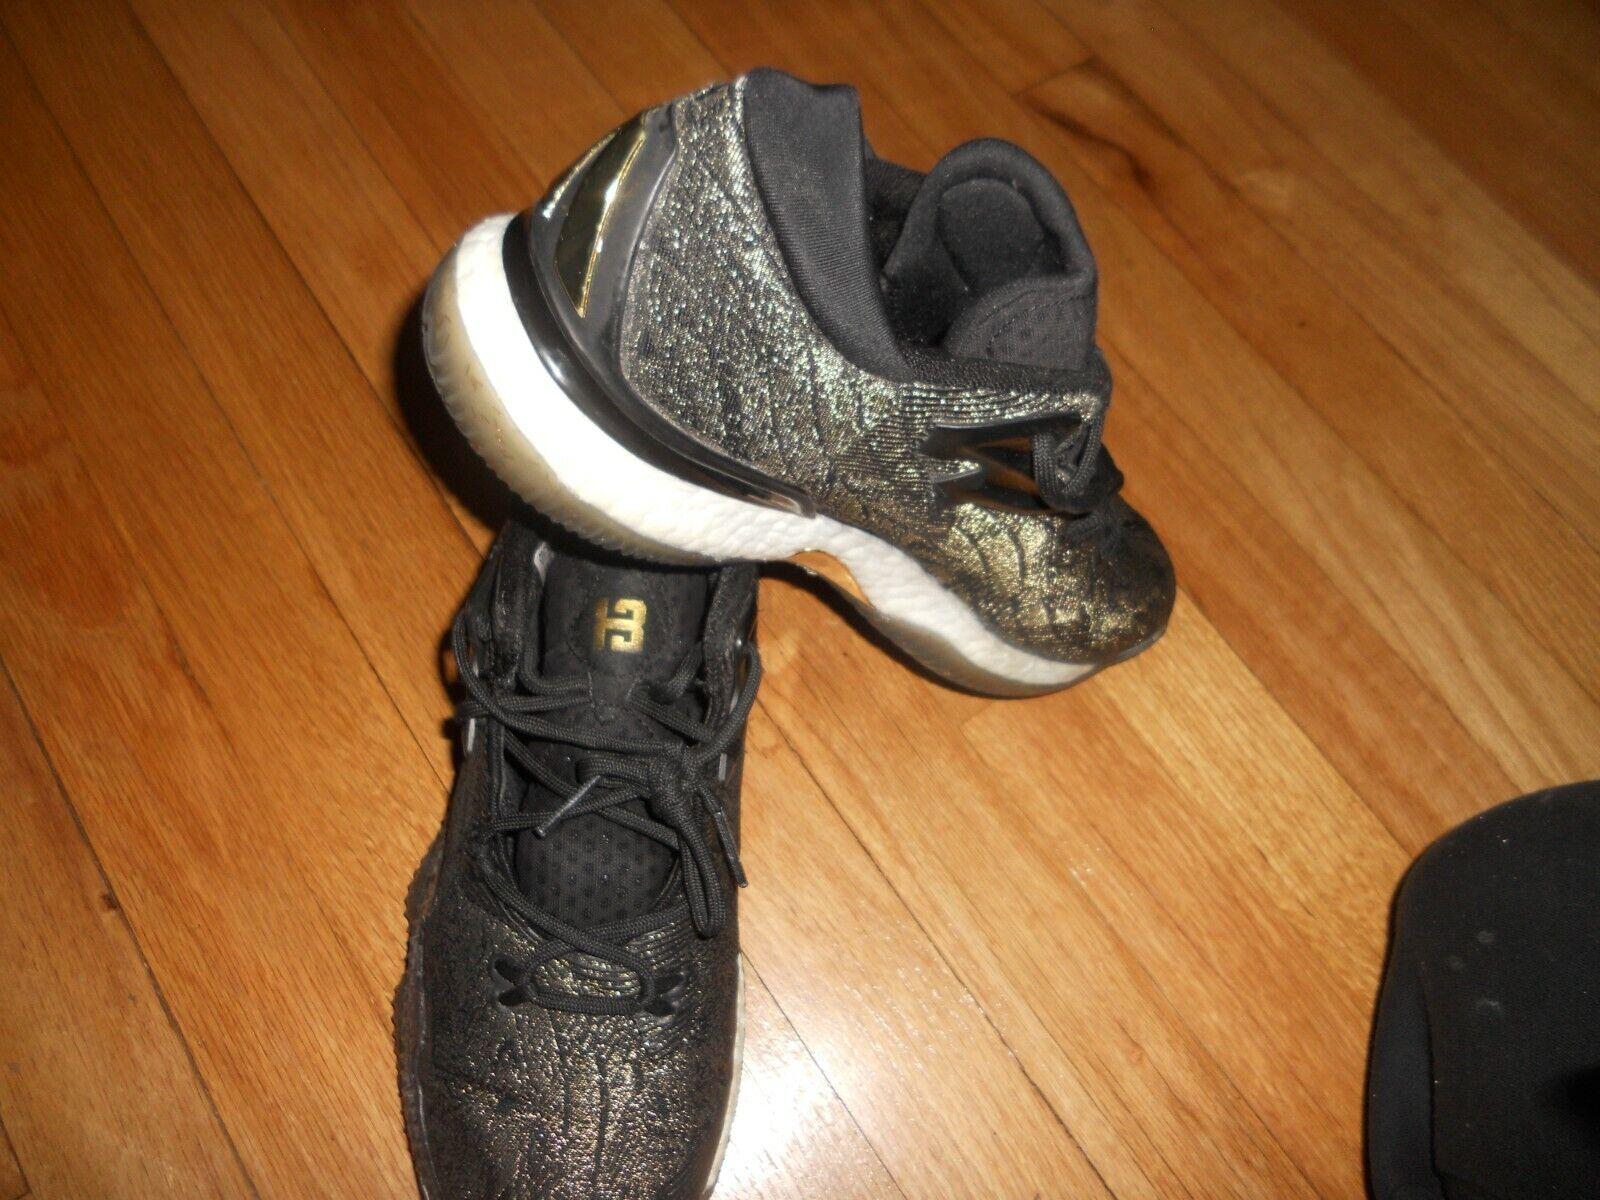 Adidas Crazylight Boost 2016 James Harden Men's 9.5 Black gold B39061 Sharp LQQK